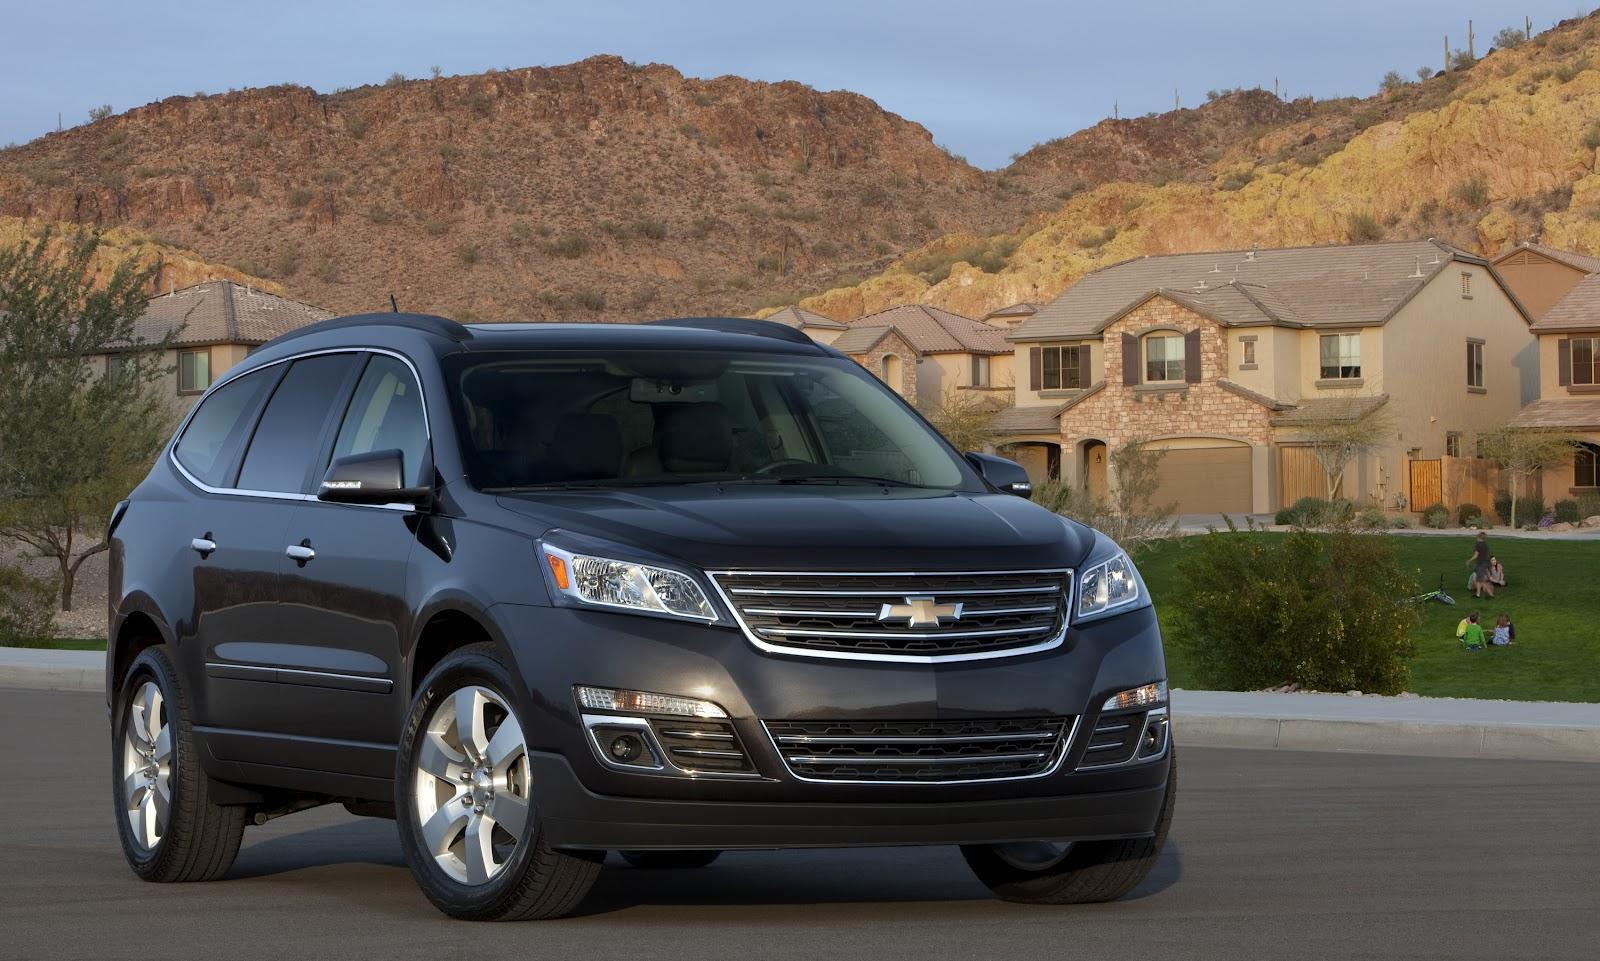 chevrolet - 2009 - [Chevrolet] traverse 2013+chevrolet+traverse+6